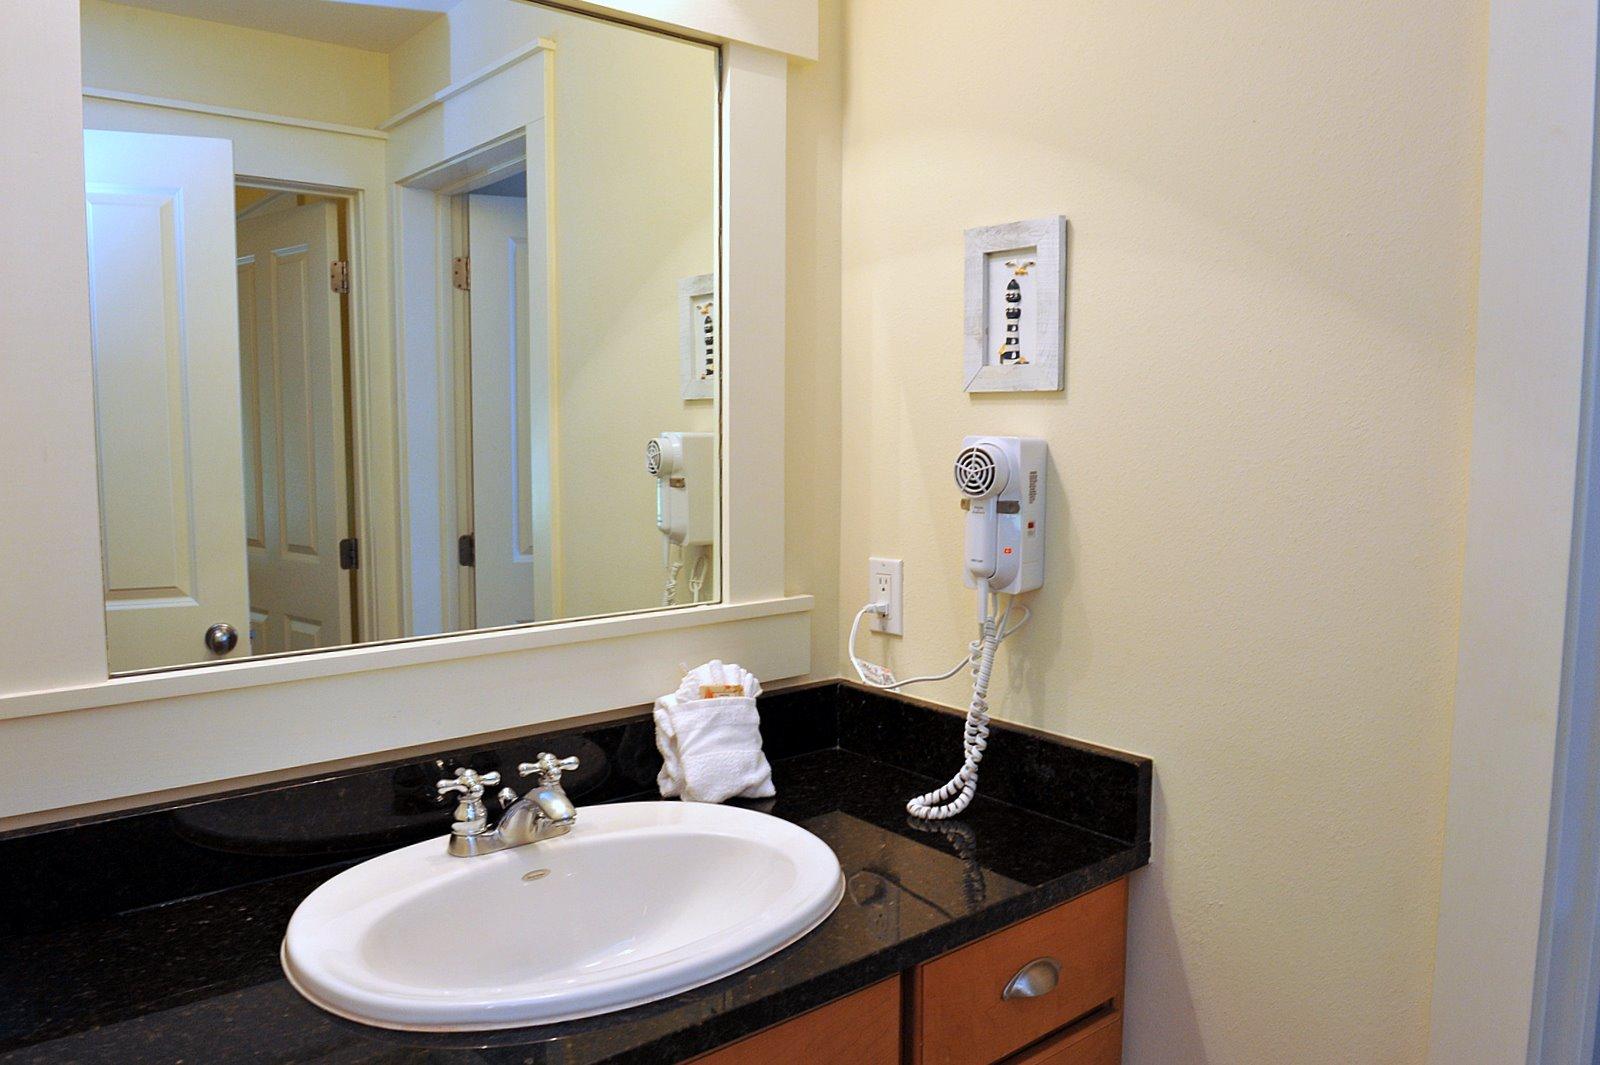 1280 Laurel Grove Condo rental in Sandestin Rentals ~ Cottages and Villas  in Destin Florida - #14